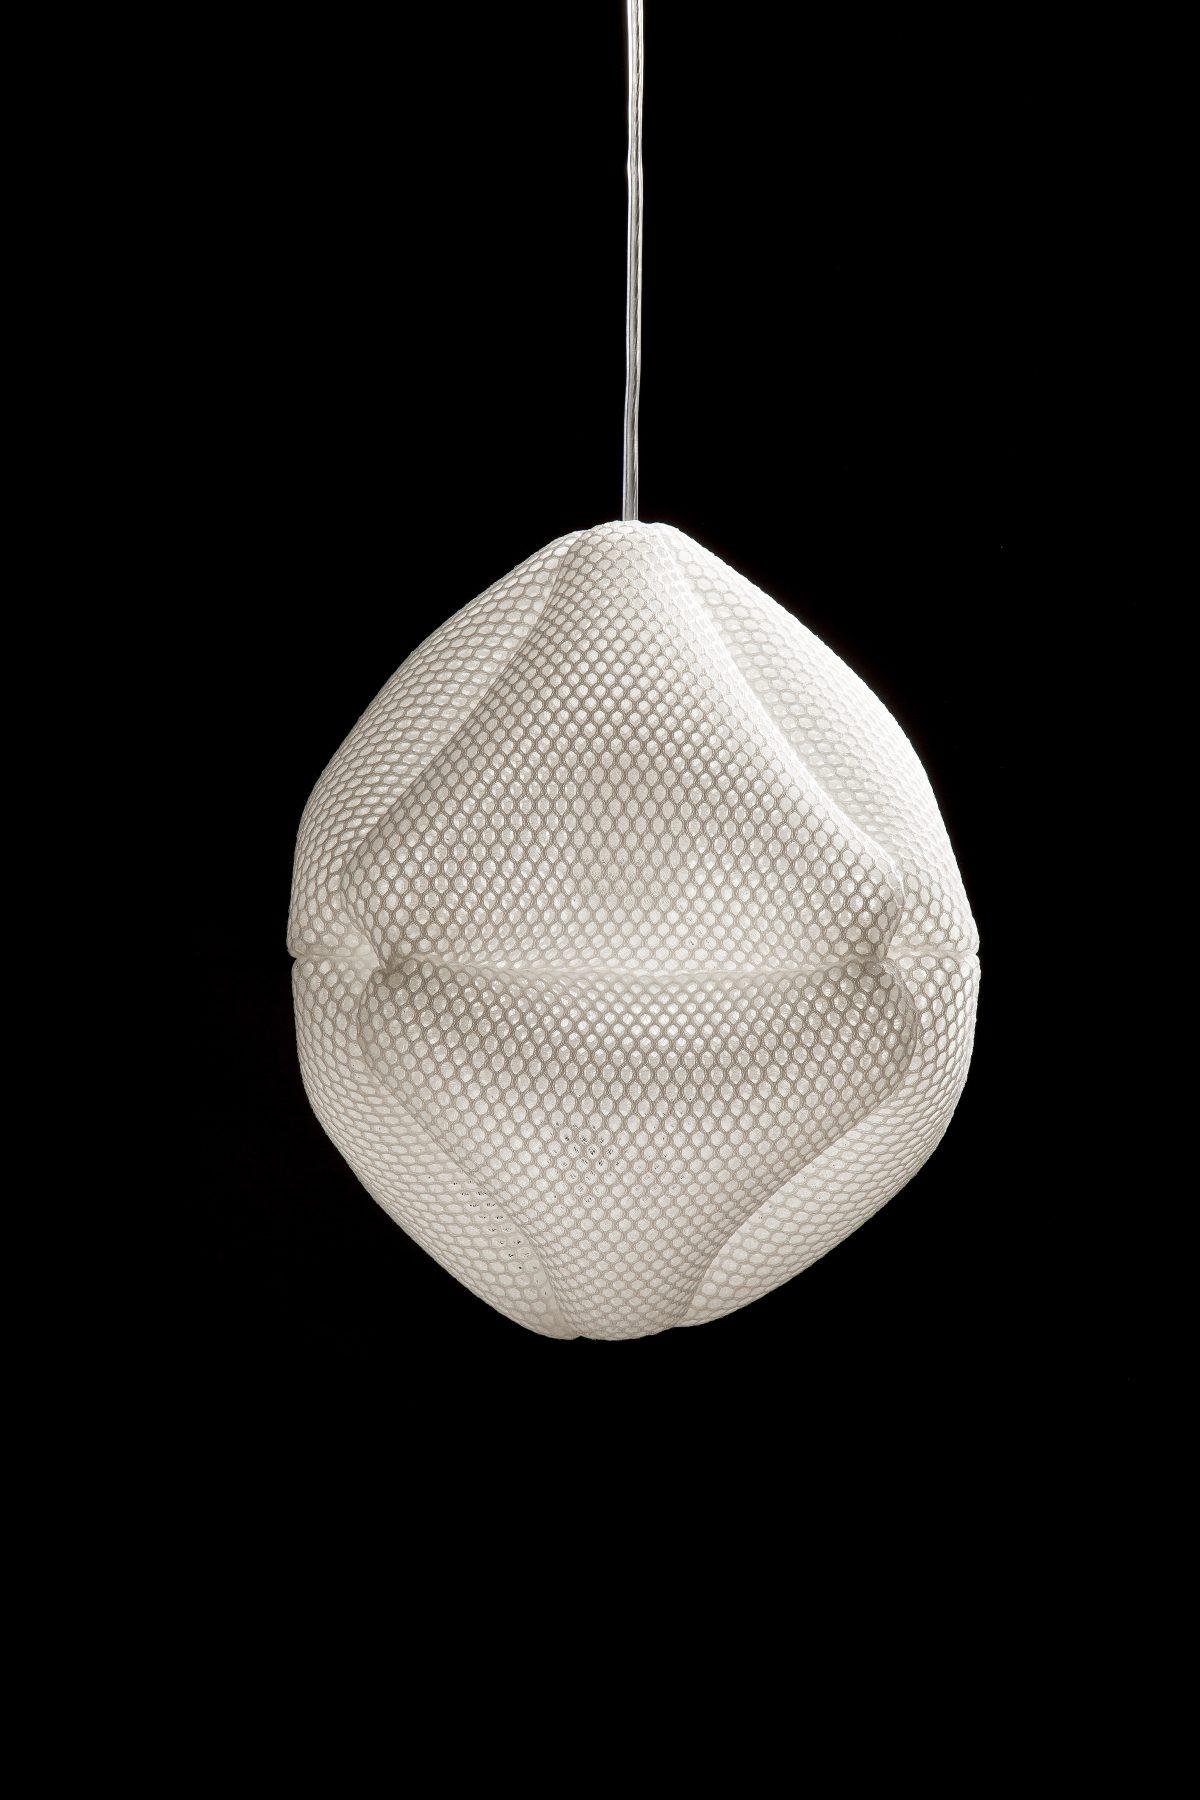 Radiolaria Ovulus Coralli hanglamp van Bernotat